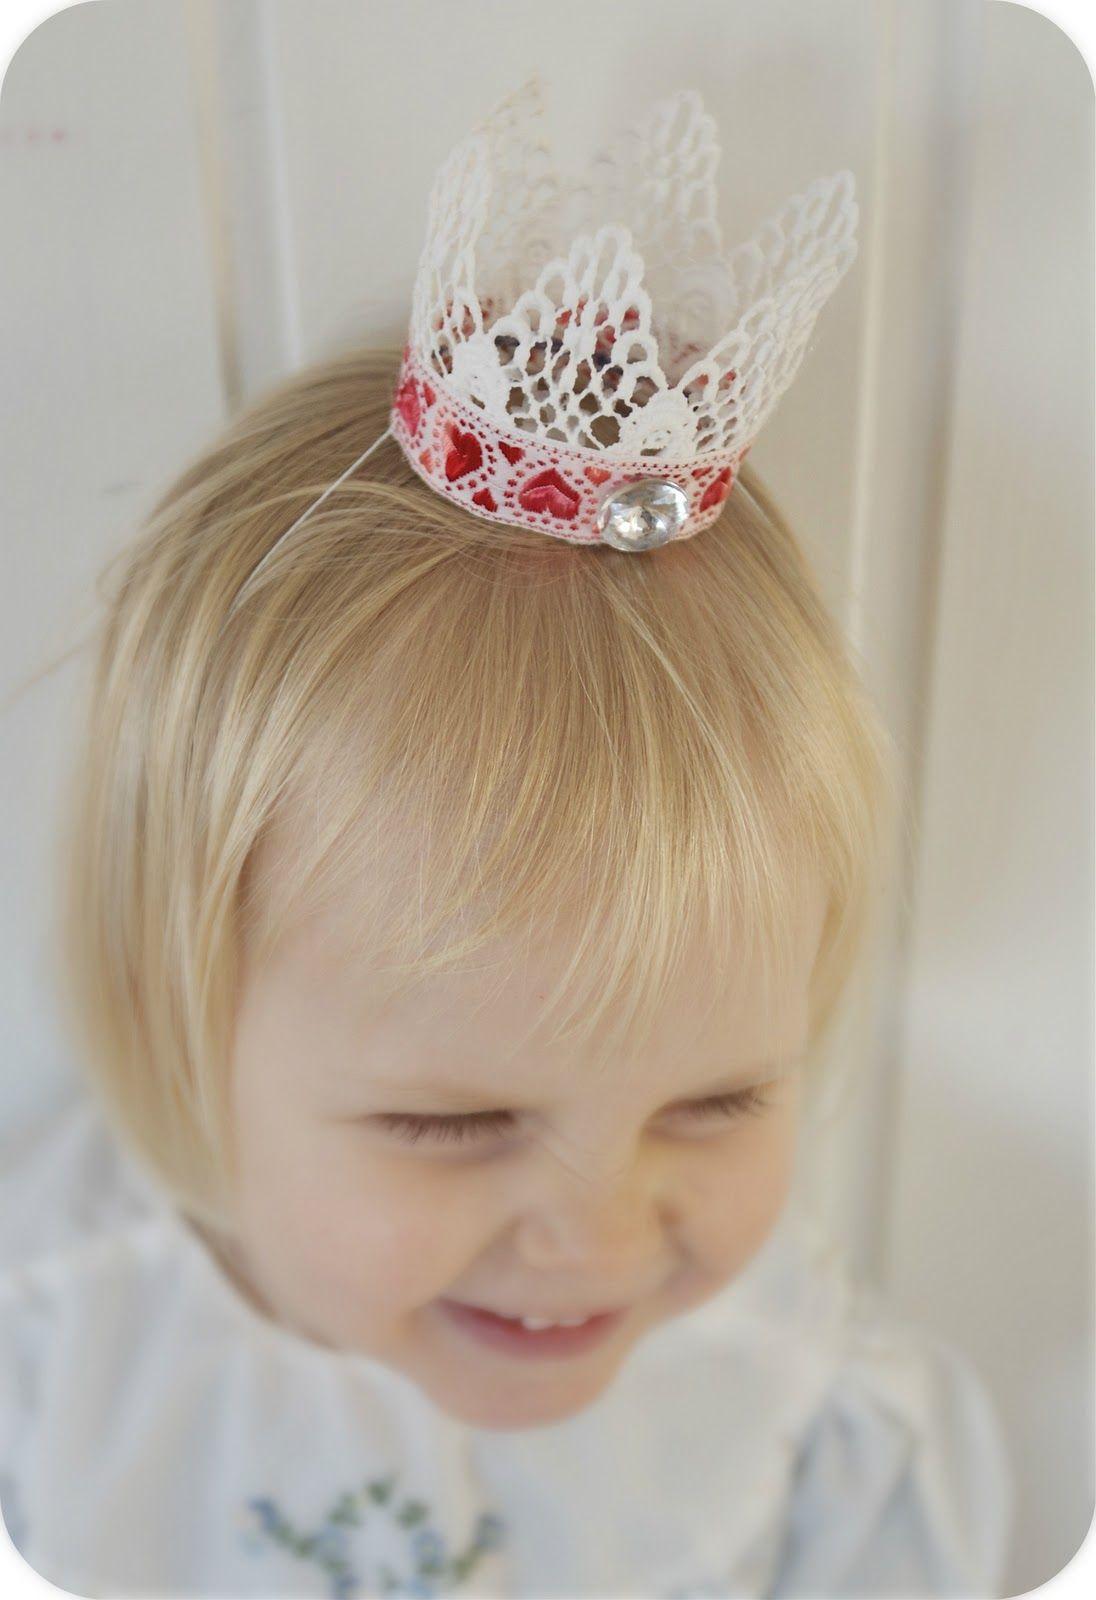 spirello: Prinsessekroner